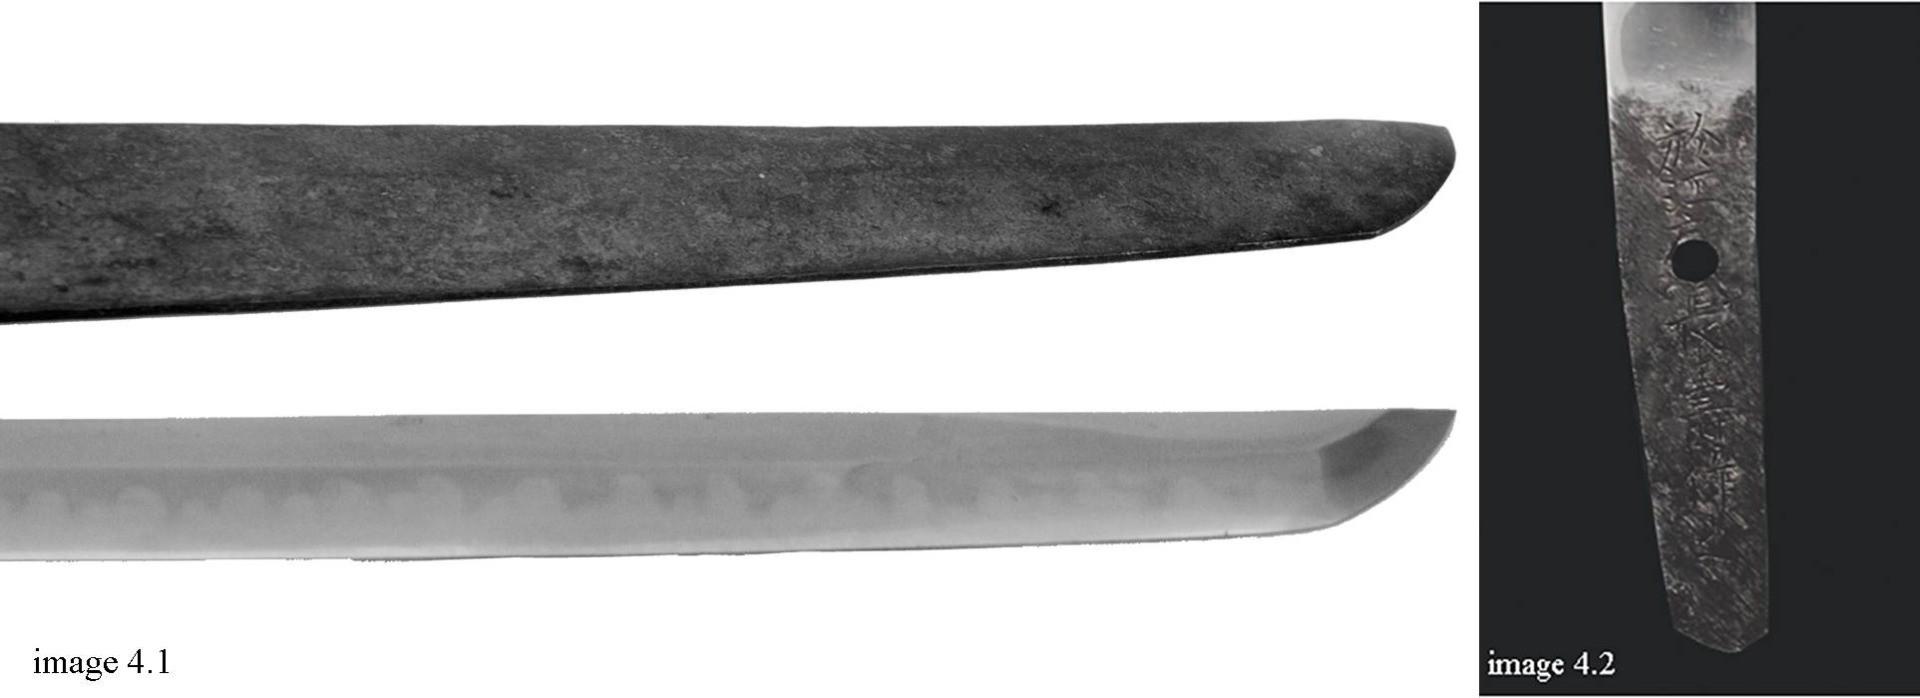 japanese sword, katana, antique